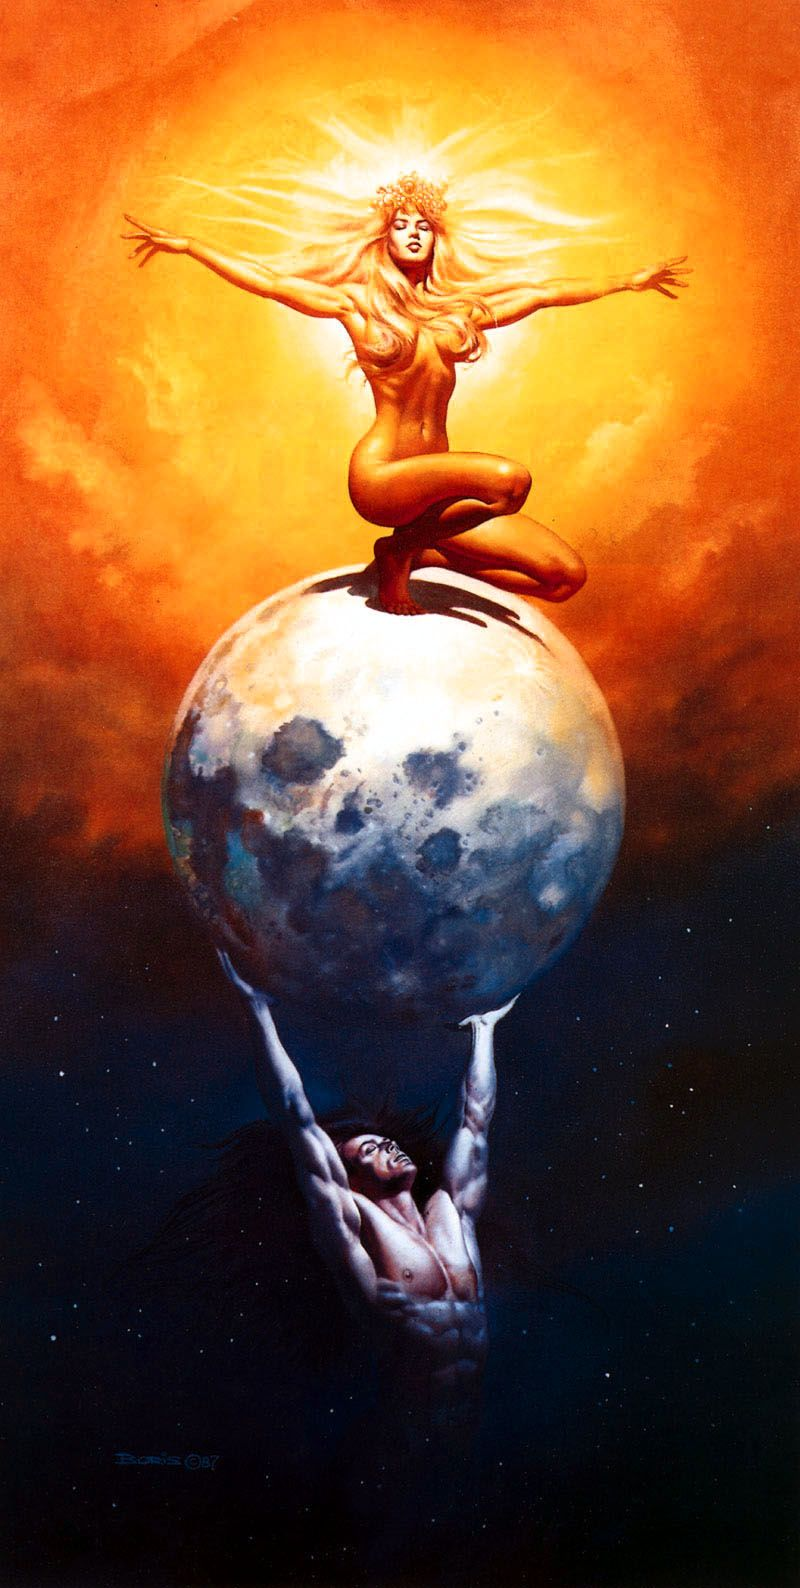 The Sun And The Moon Boris Vallejo,1987, Th...